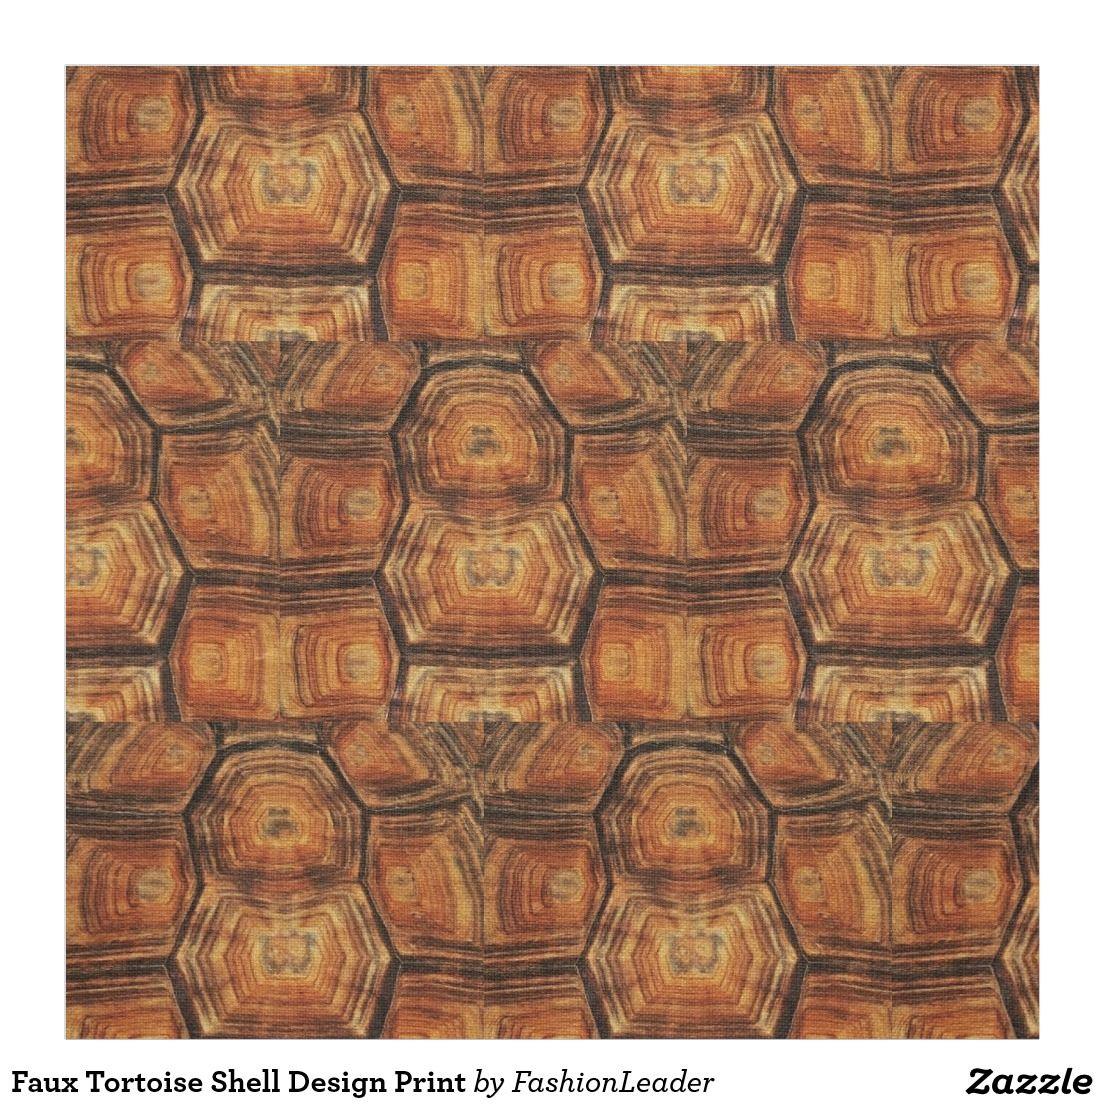 Faux Tortoise Shell Design Print Fabric Printing On Fabric Tortoise Shell Fabric